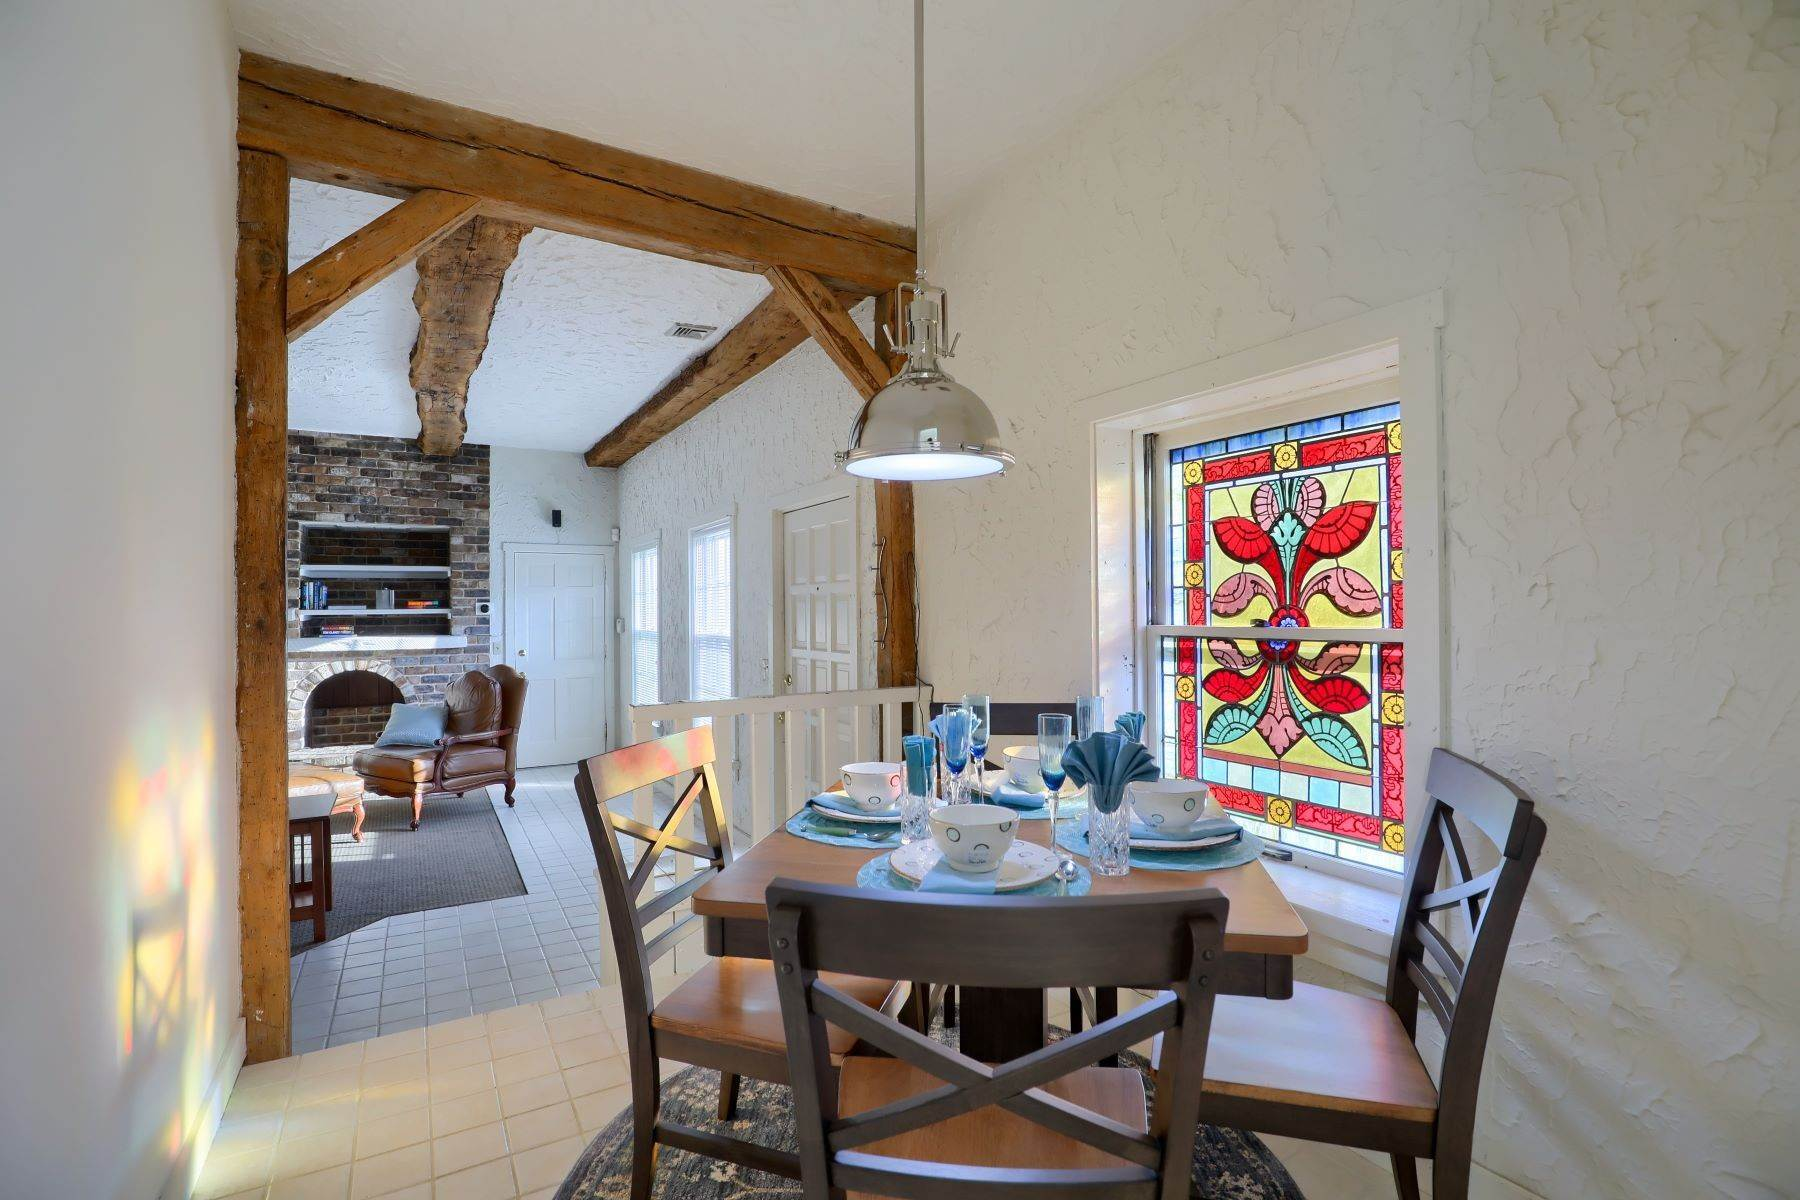 18. Single Family Homes for Sale at 206 E Granada Ave Hershey, Pennsylvania 17033 United States